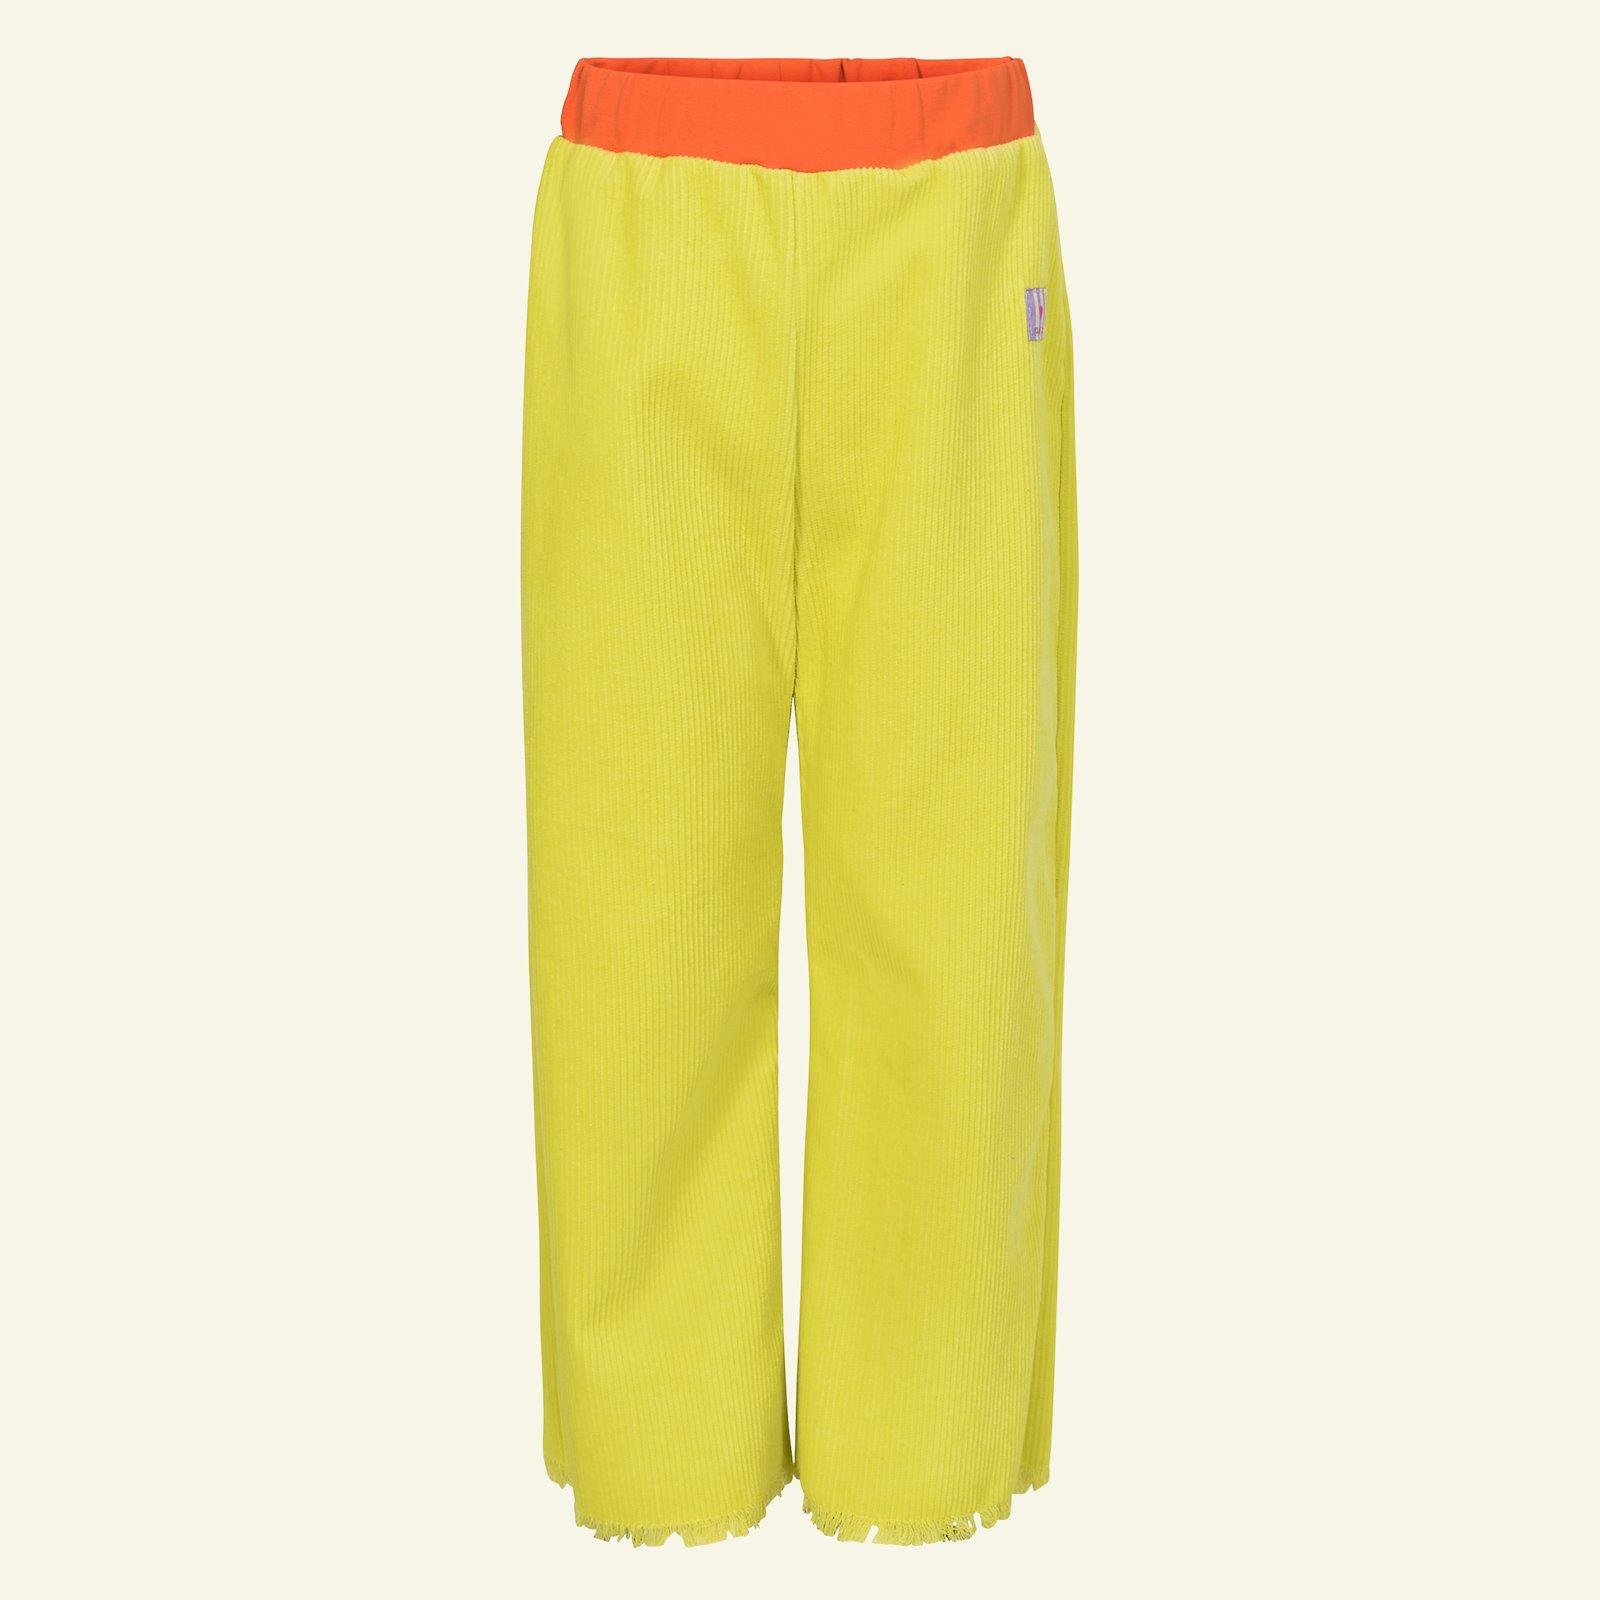 High waist and wide lege trouser, 152/12 p60034_430822_272319_26455_sskit